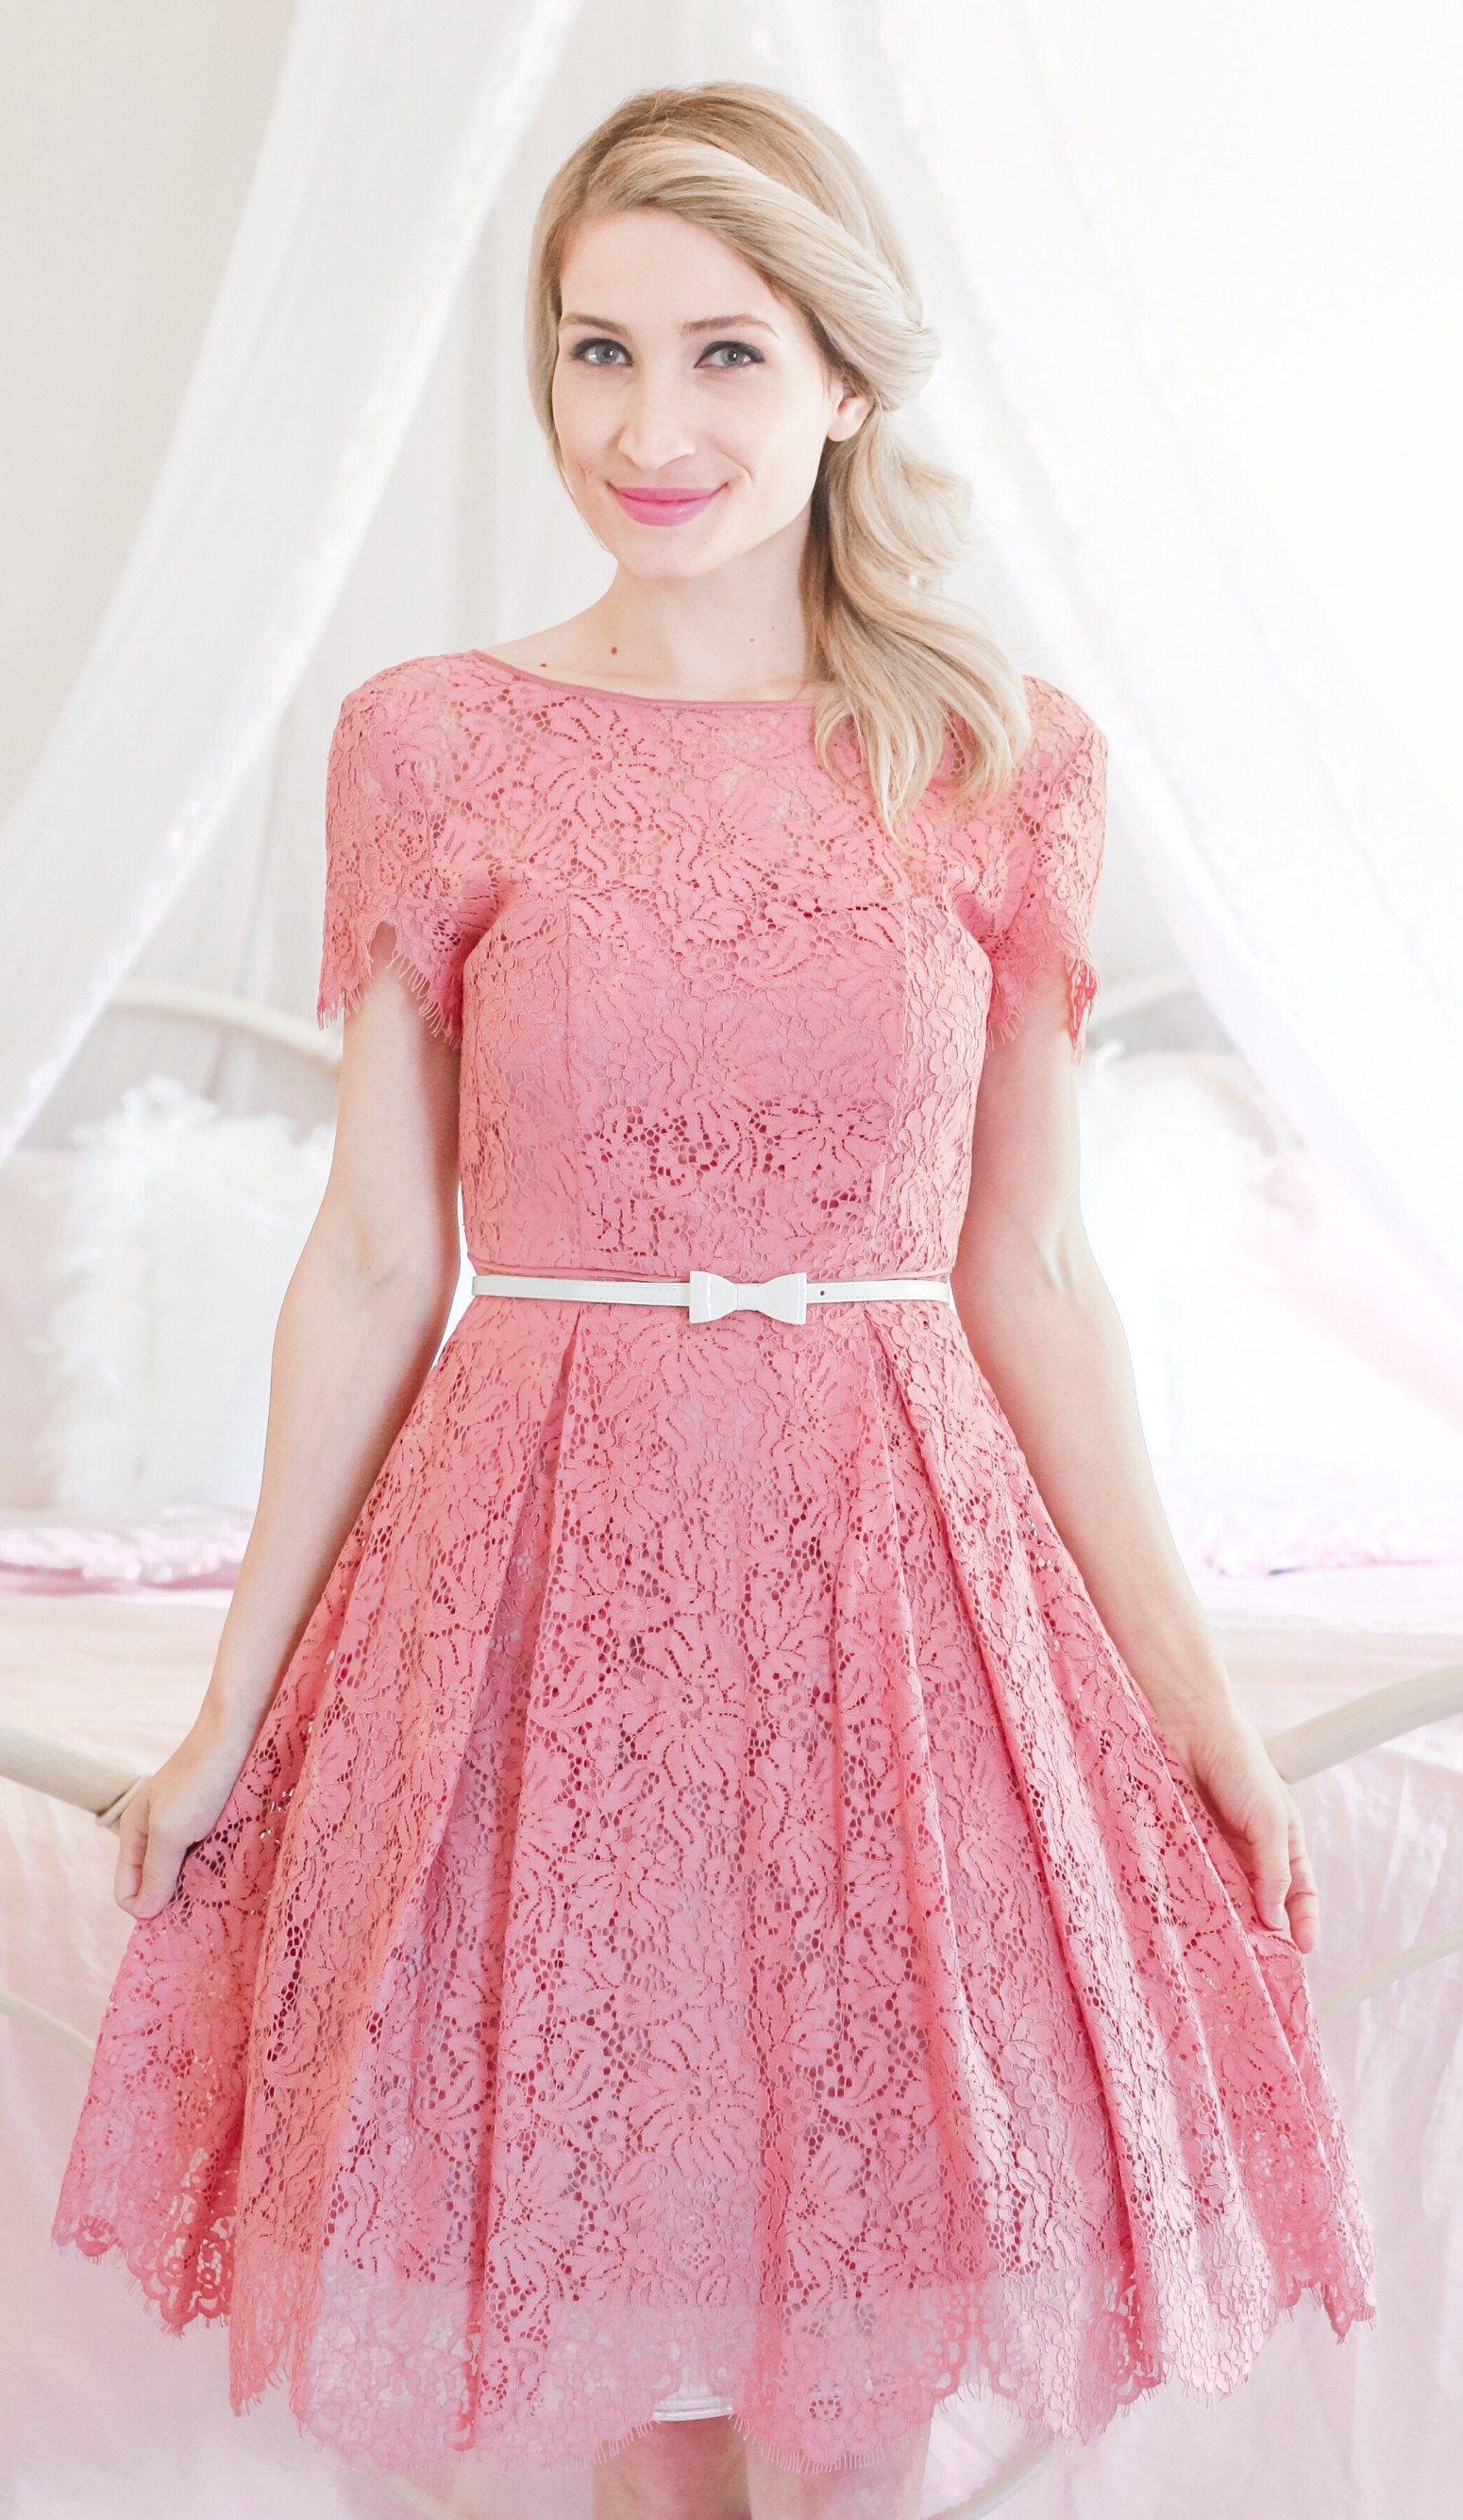 Dresses From The Marks & Spencer Wedding Shop | Damas, Ropa y Vestiditos